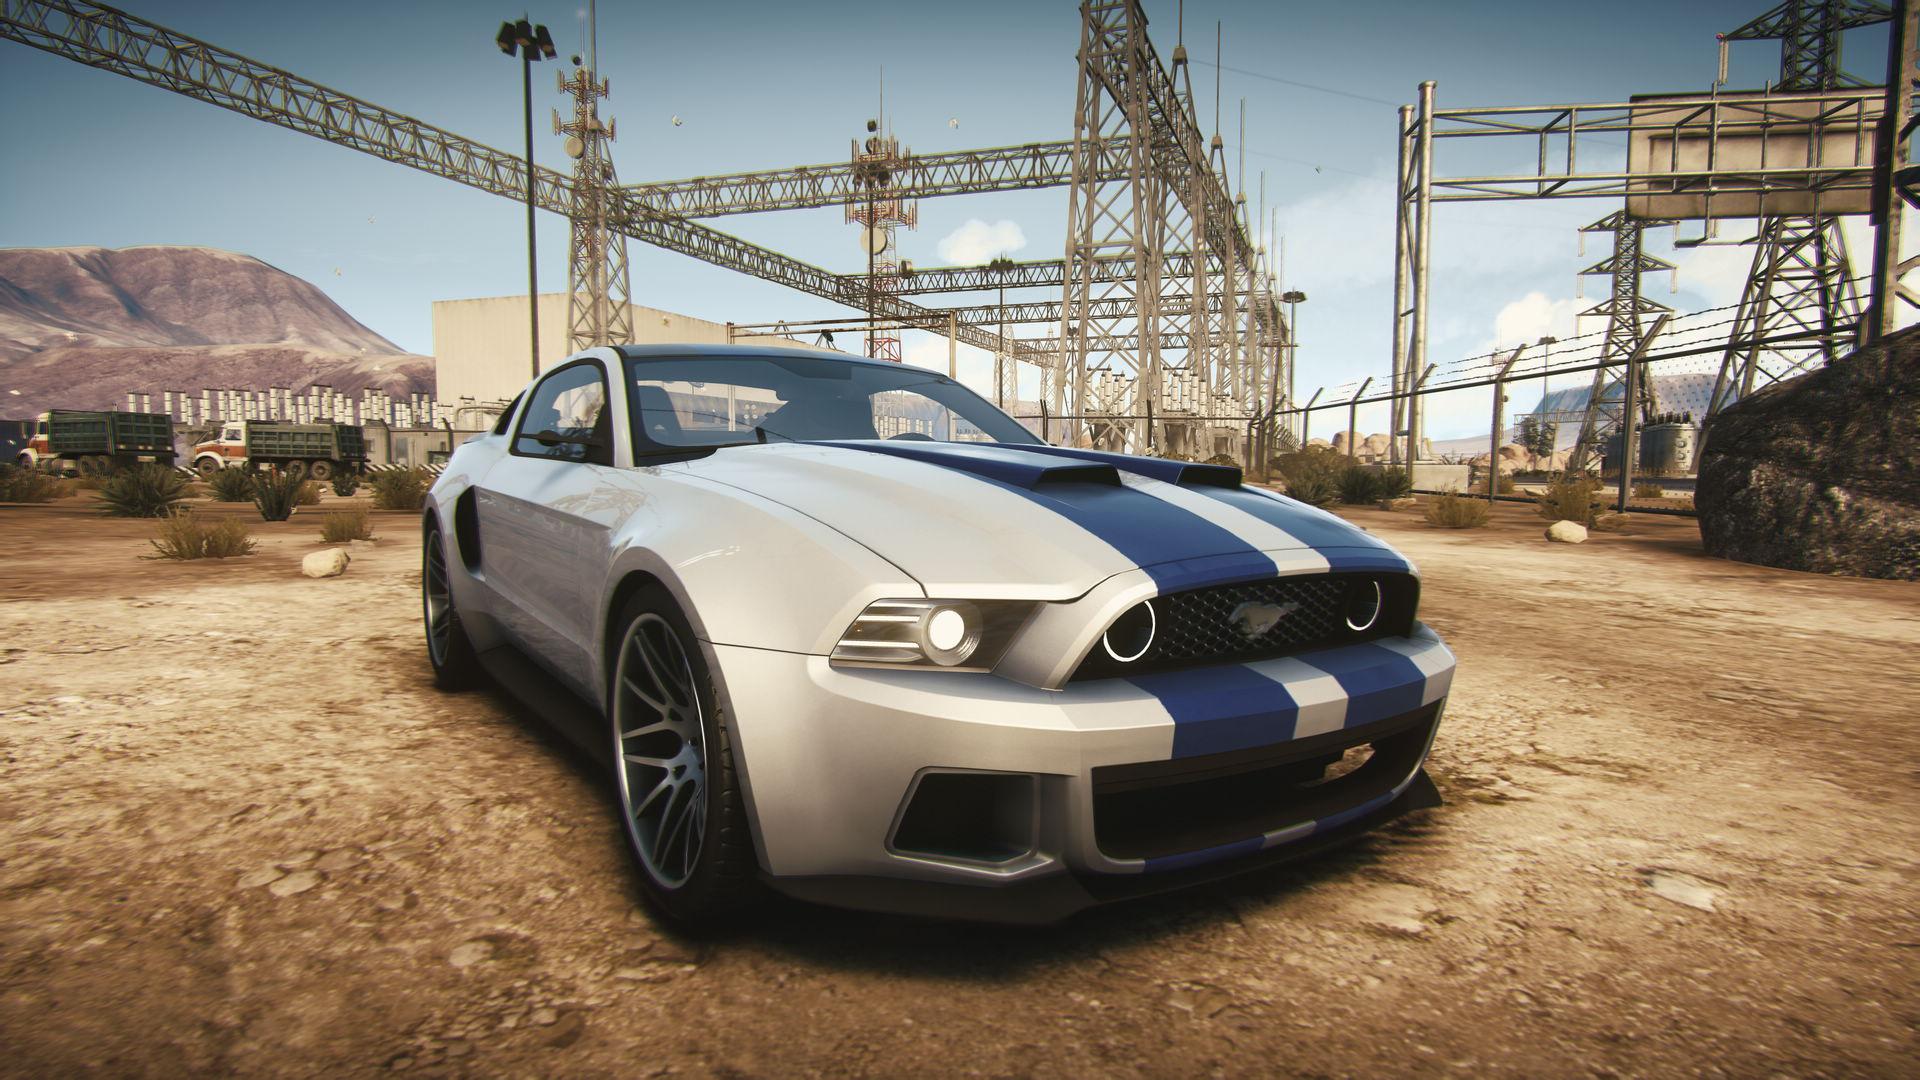 Car_Ford_MustangGT_2014.jpg